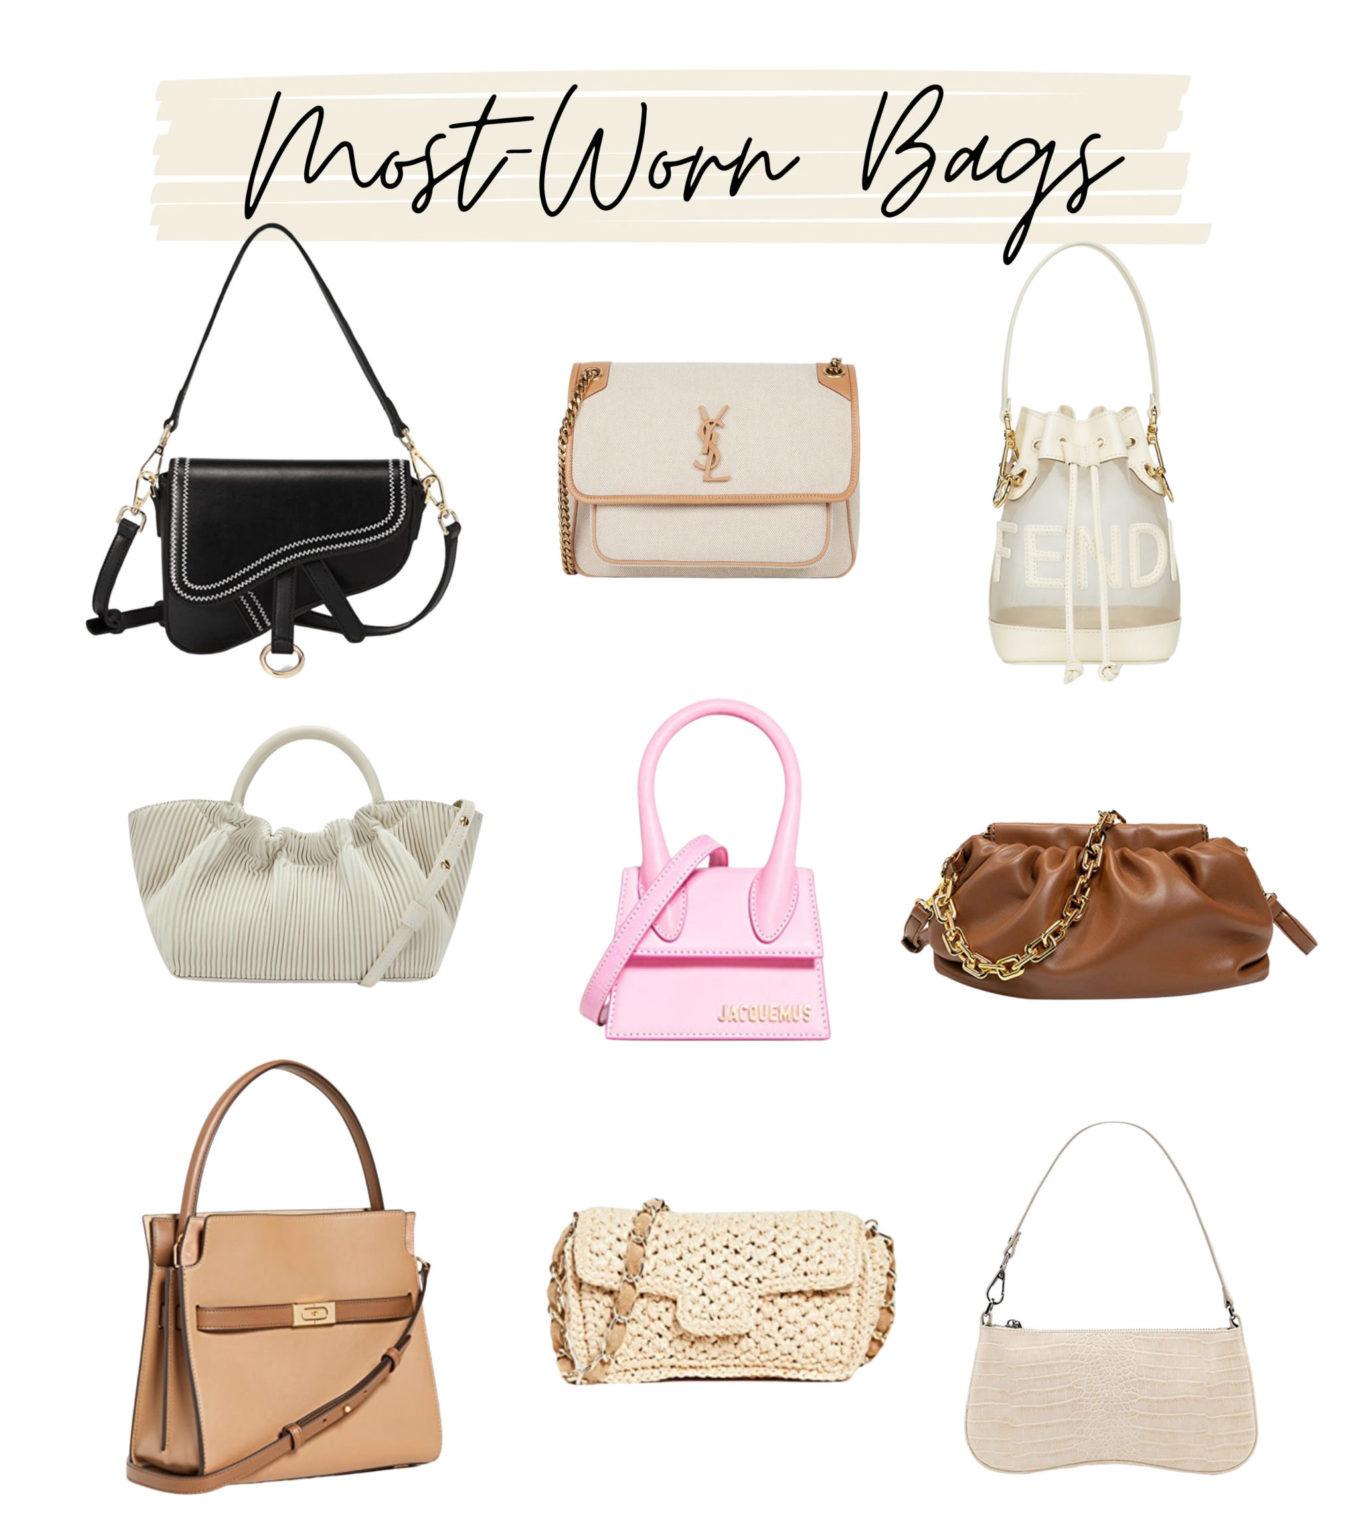 most-worn handbags, amazon bags